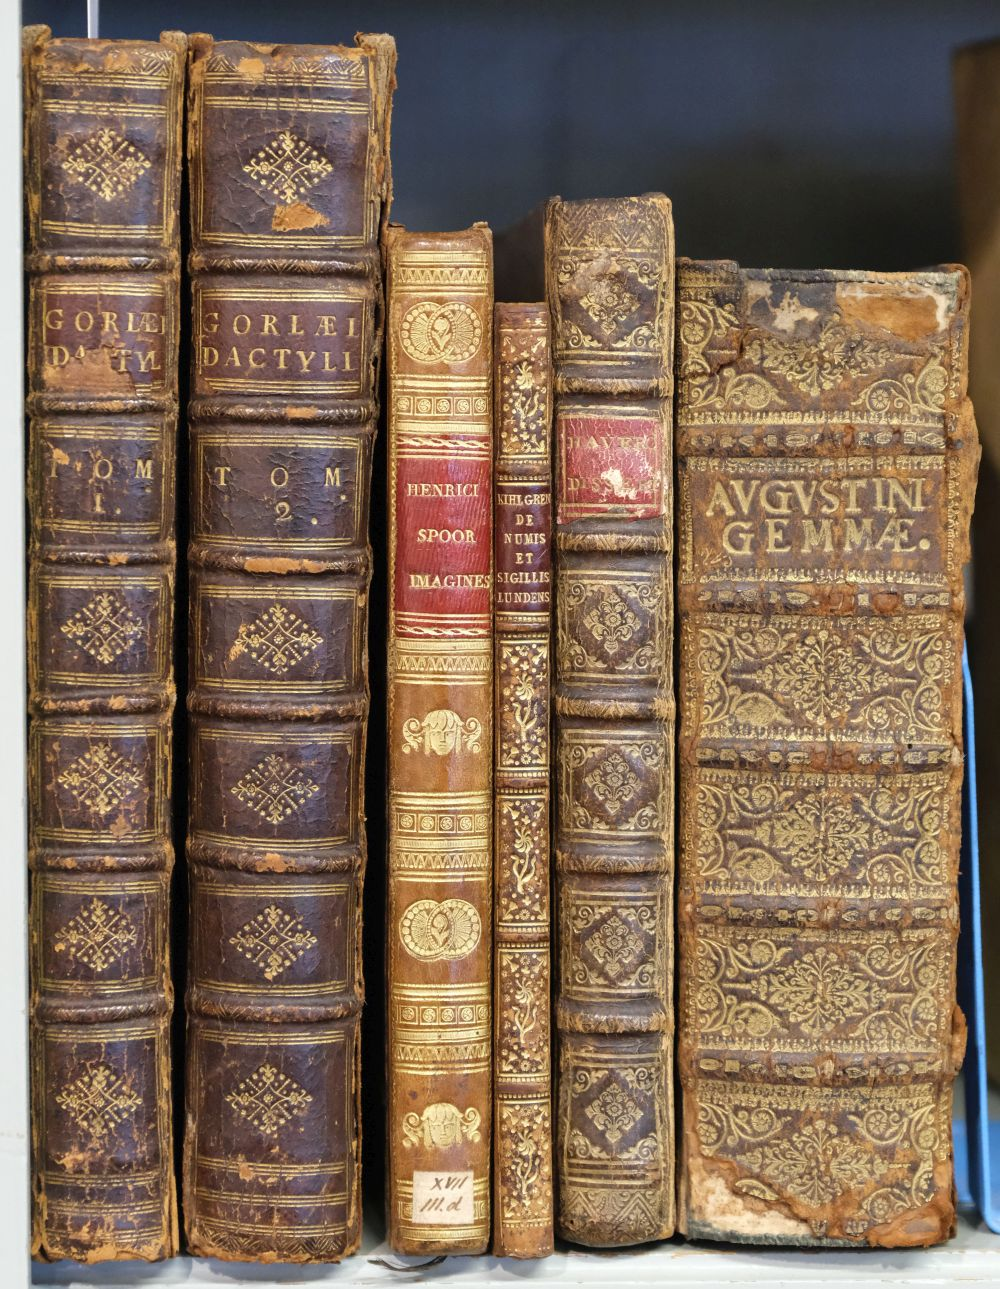 Gorlaeus (Abraham). Dactyliothecae, 2 volumes, 1707